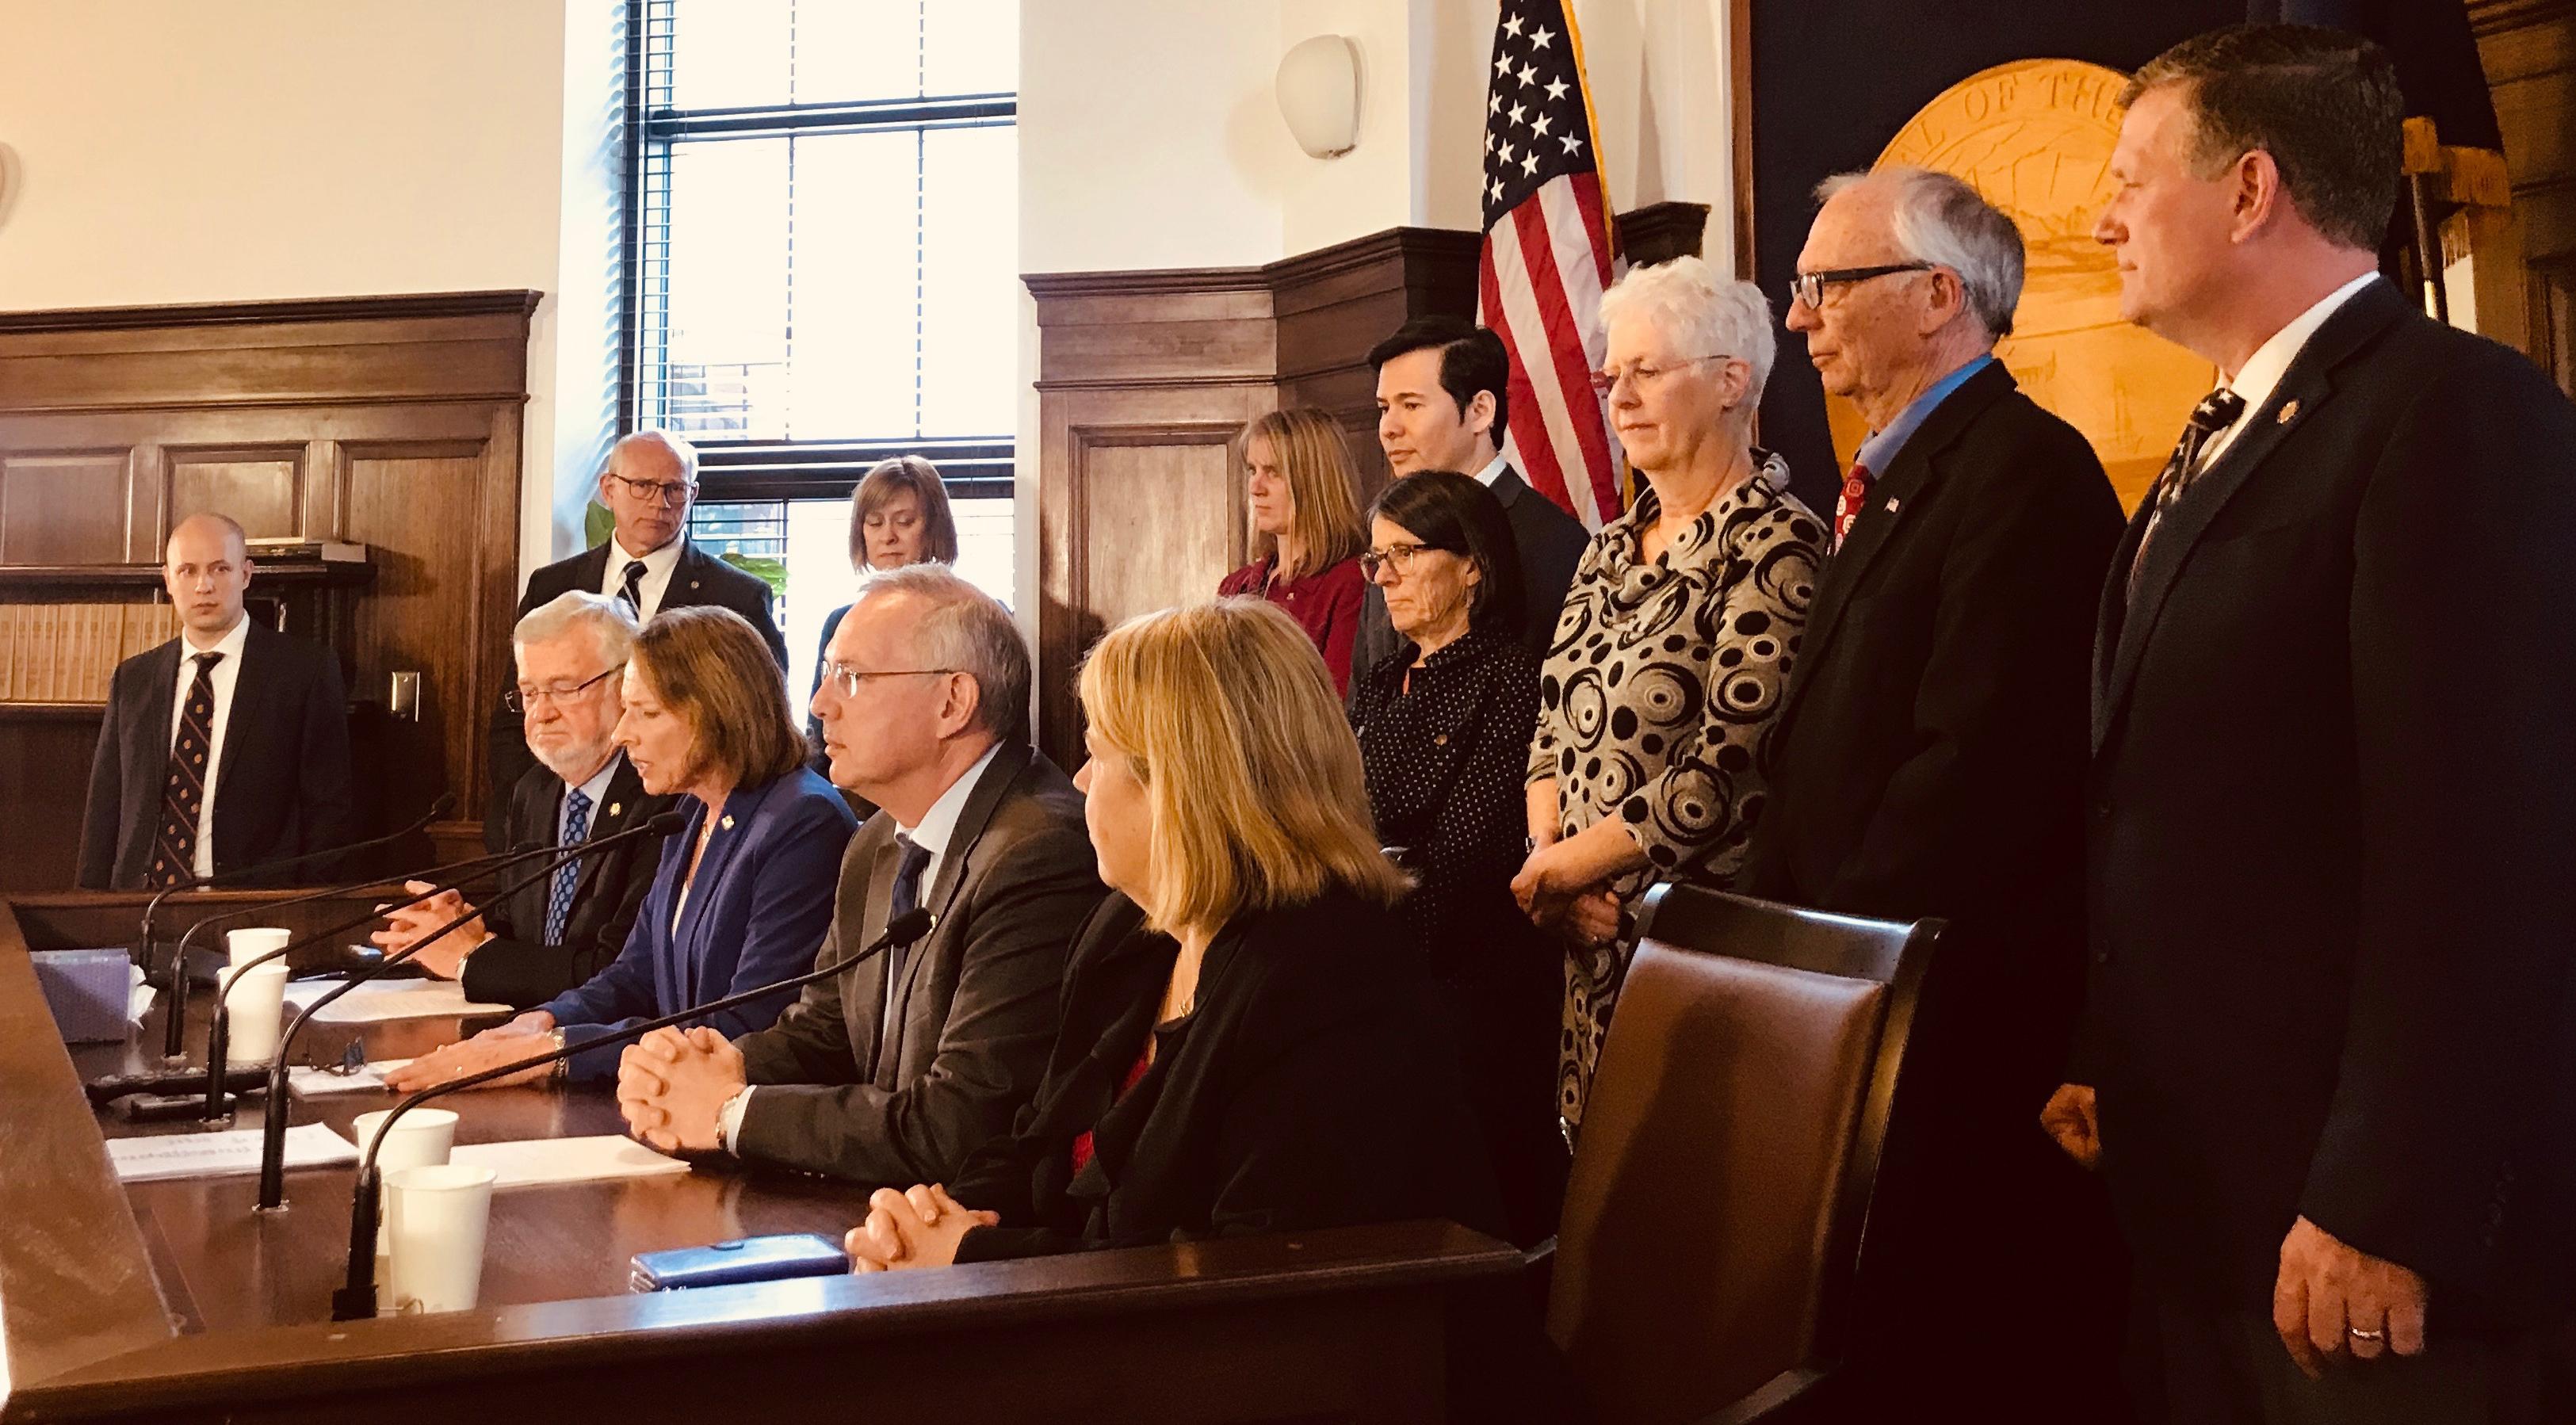 Legislature authorizes Legislative Council to defend education funding, prevent pink slips